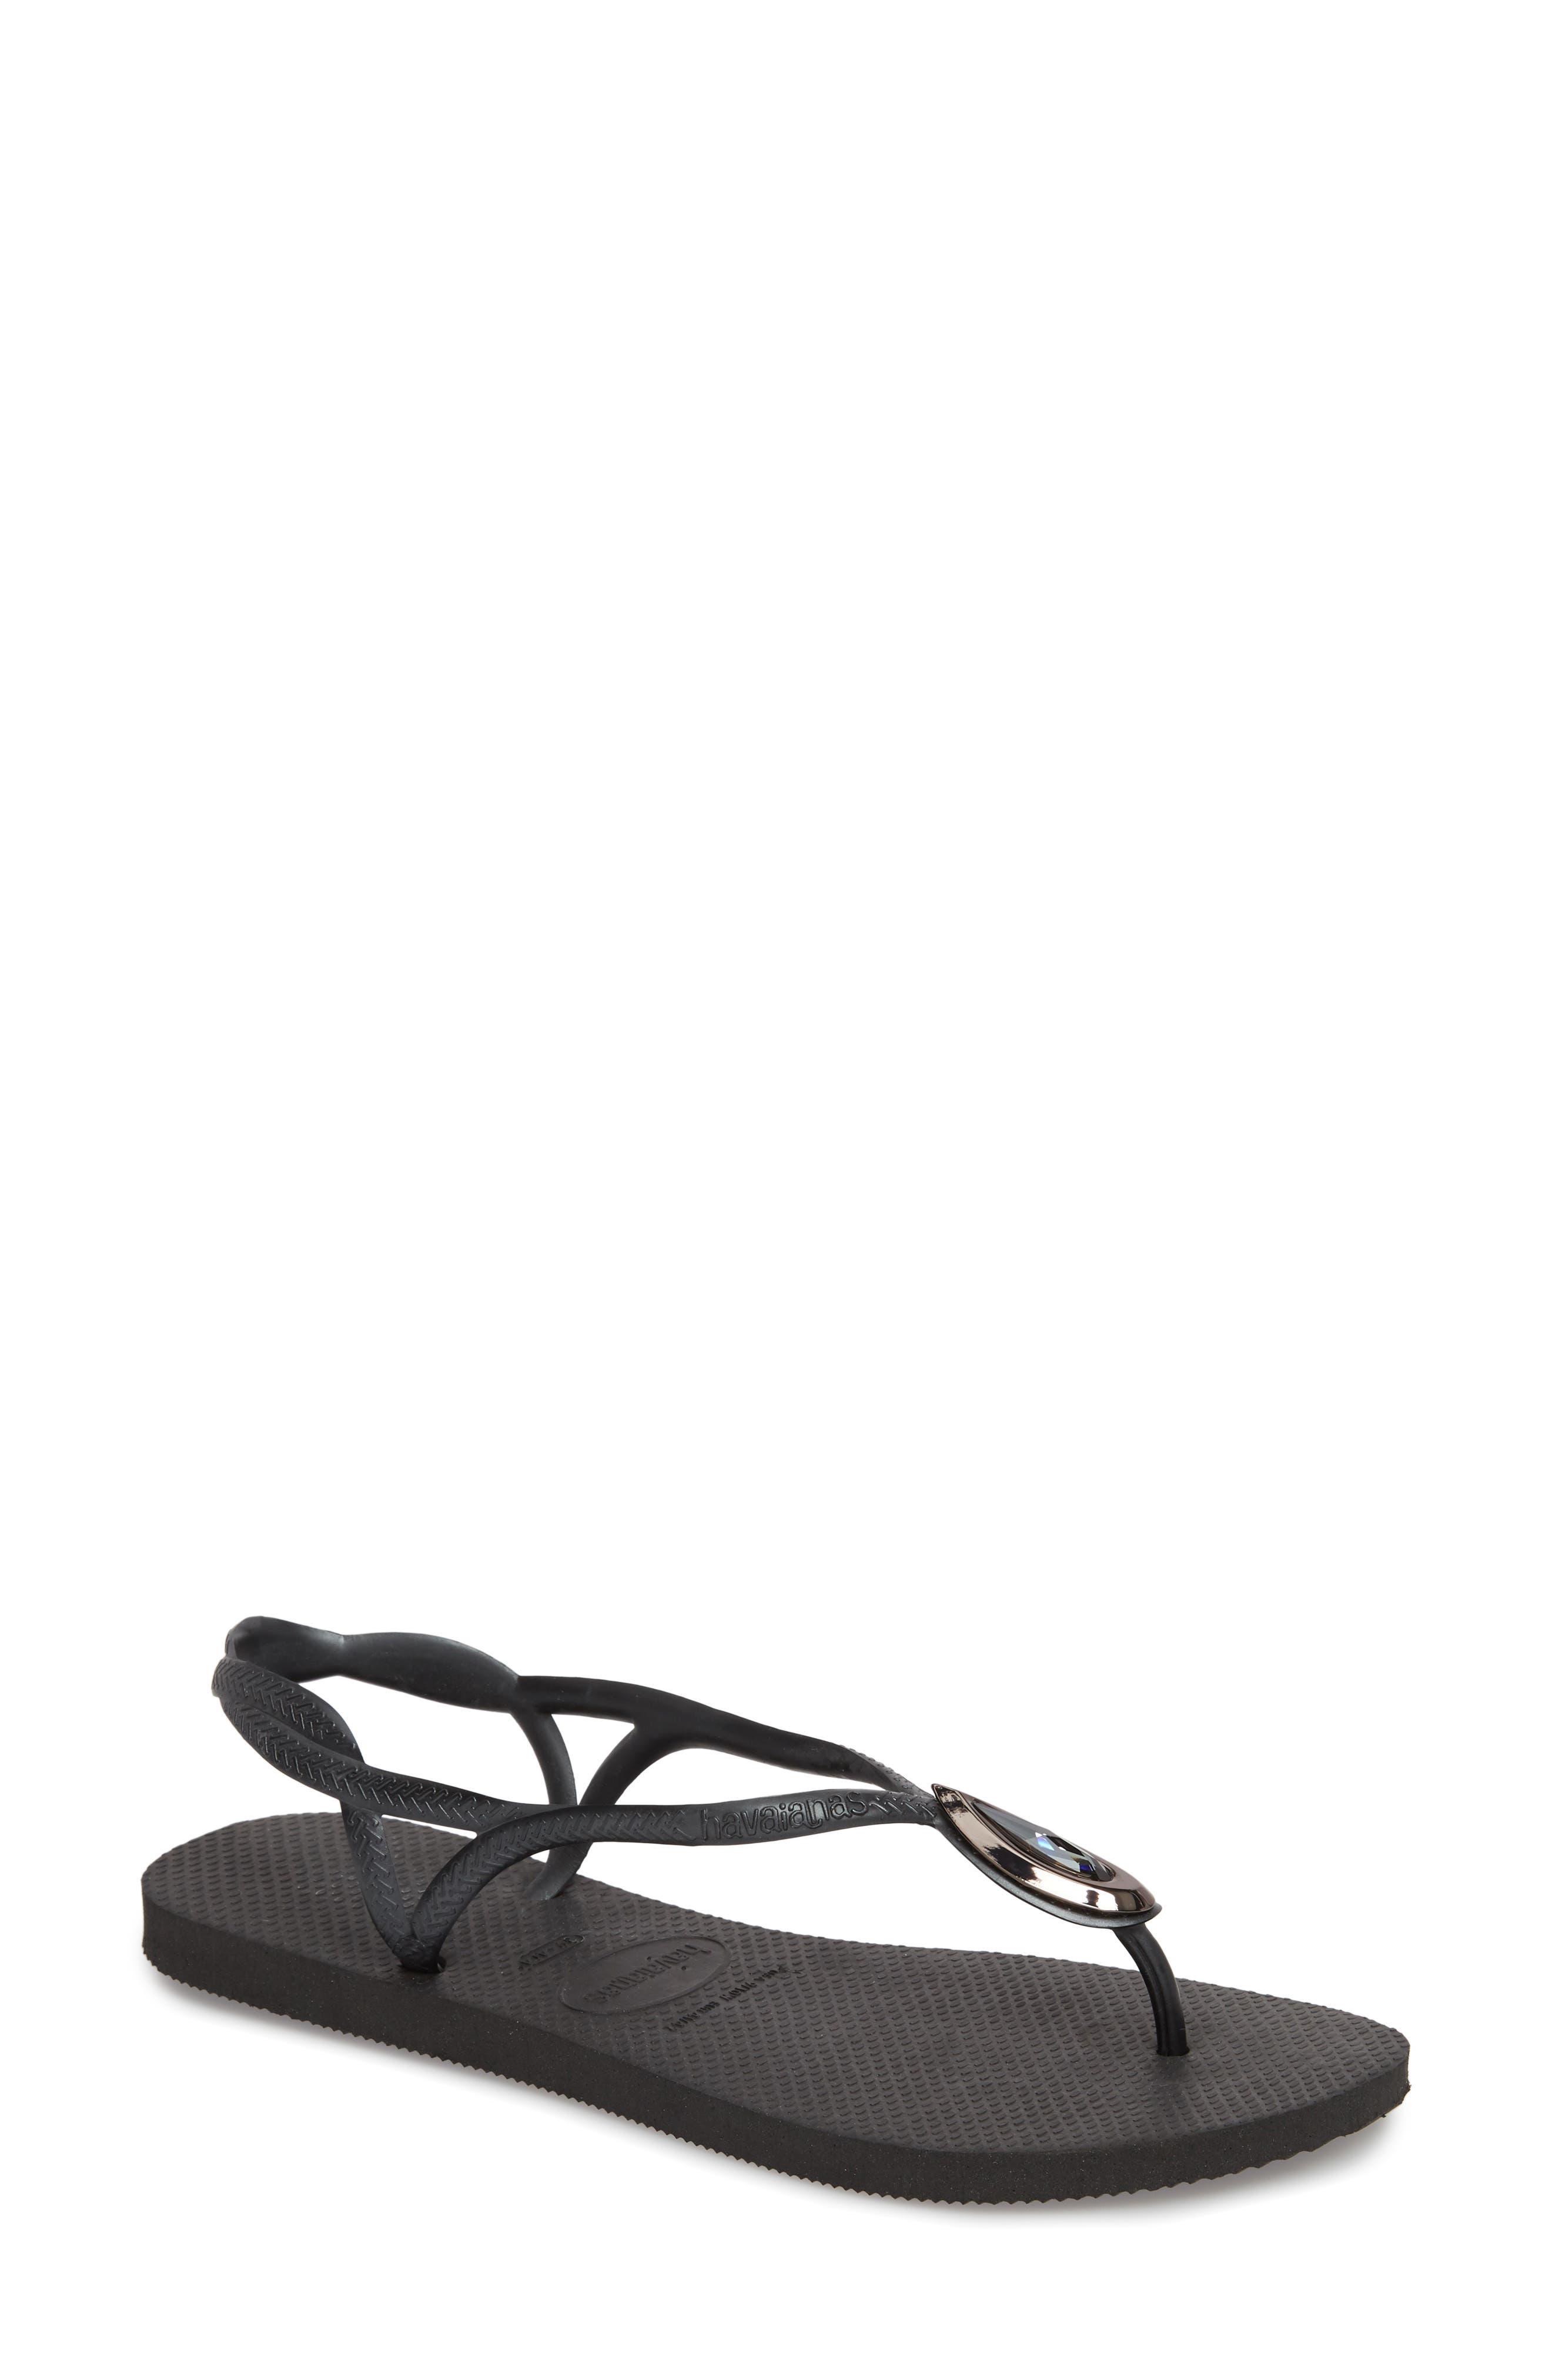 Luna Sandal,                             Main thumbnail 1, color,                             BLACK/ BLACK